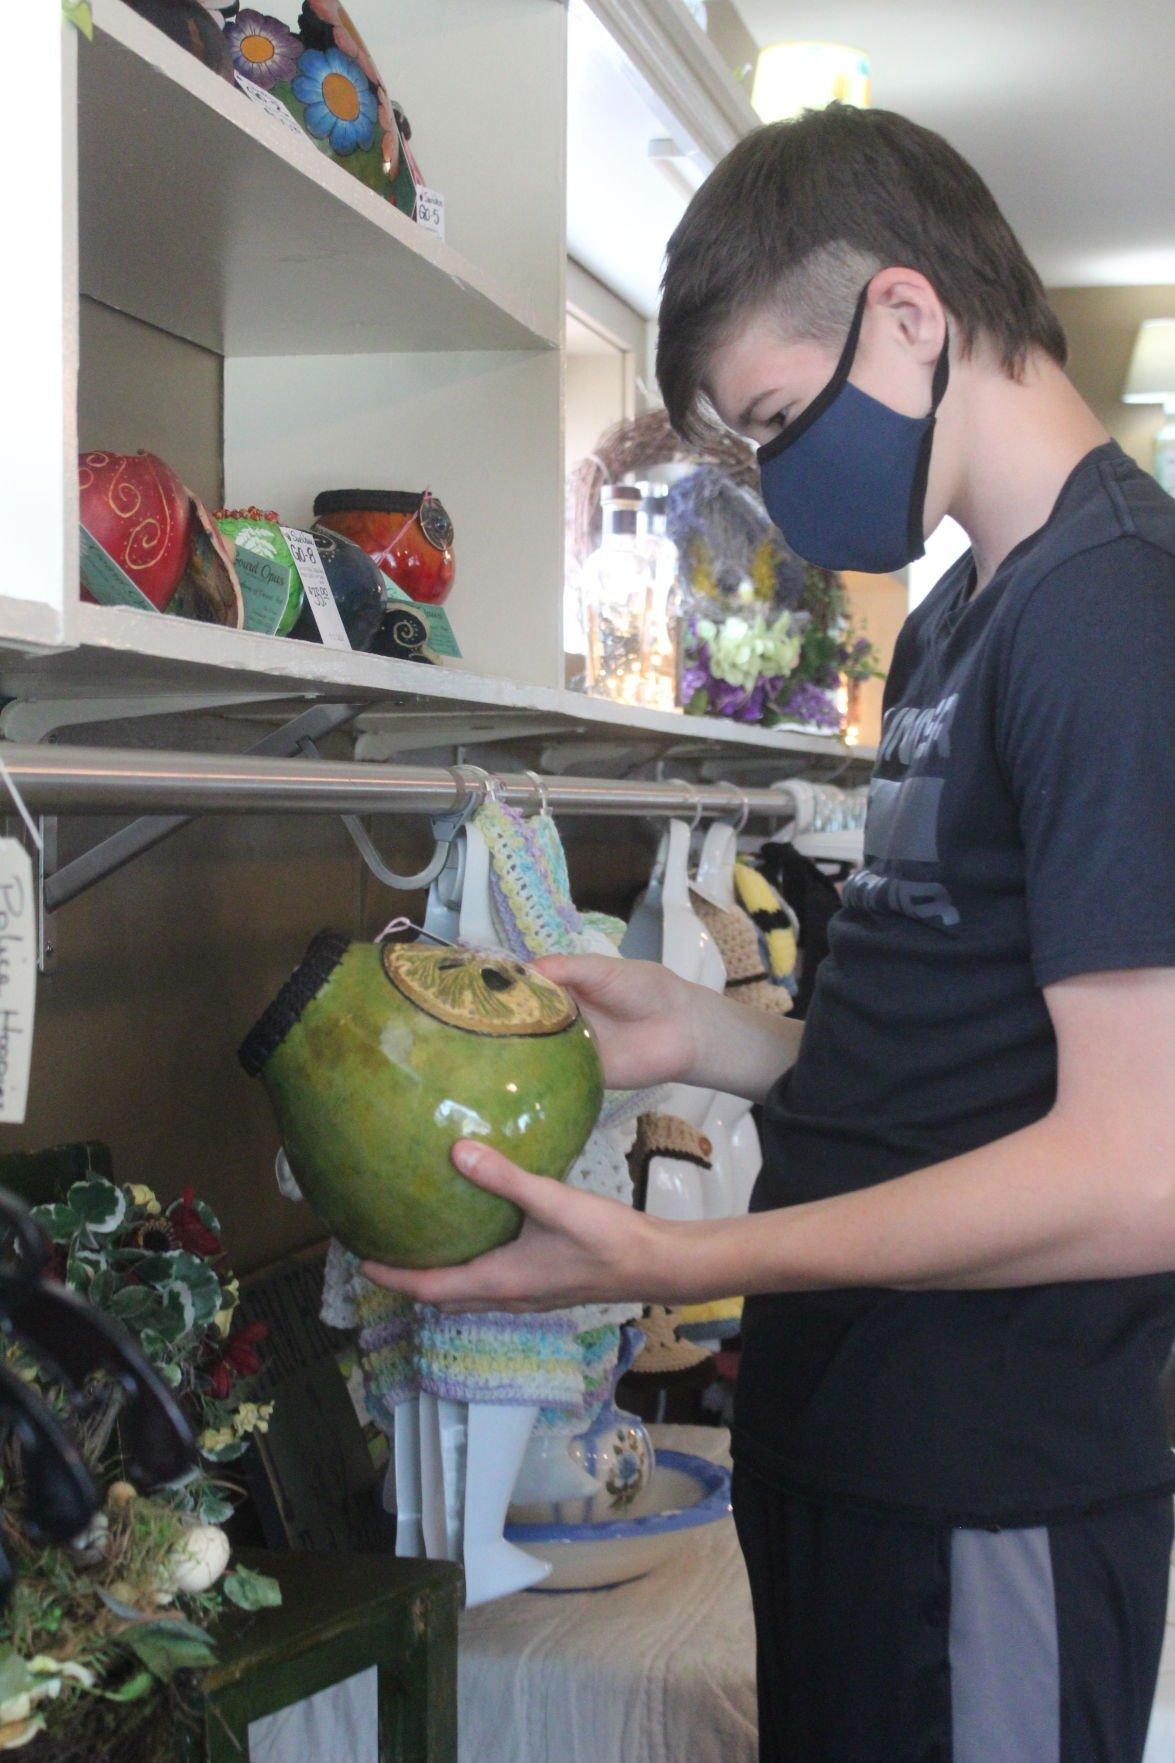 Heart Felt Gifts is an artful boutique in Rising Sun